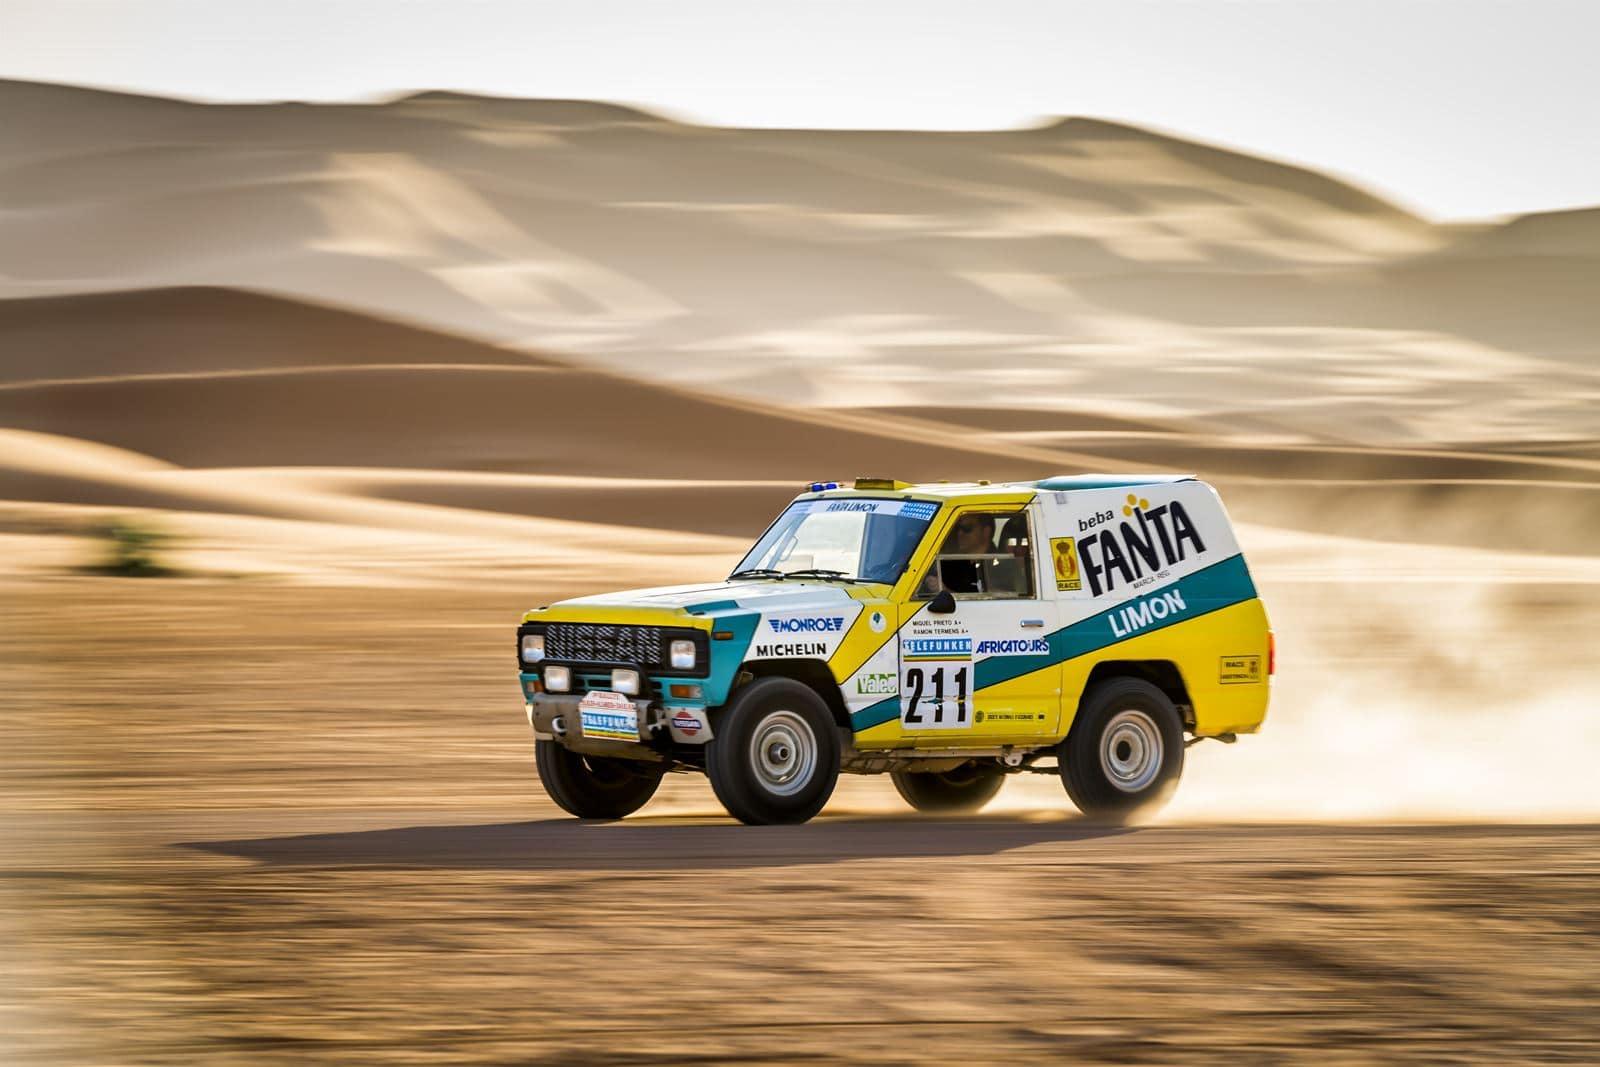 Nissan Patrol Fanta Limón Dakar